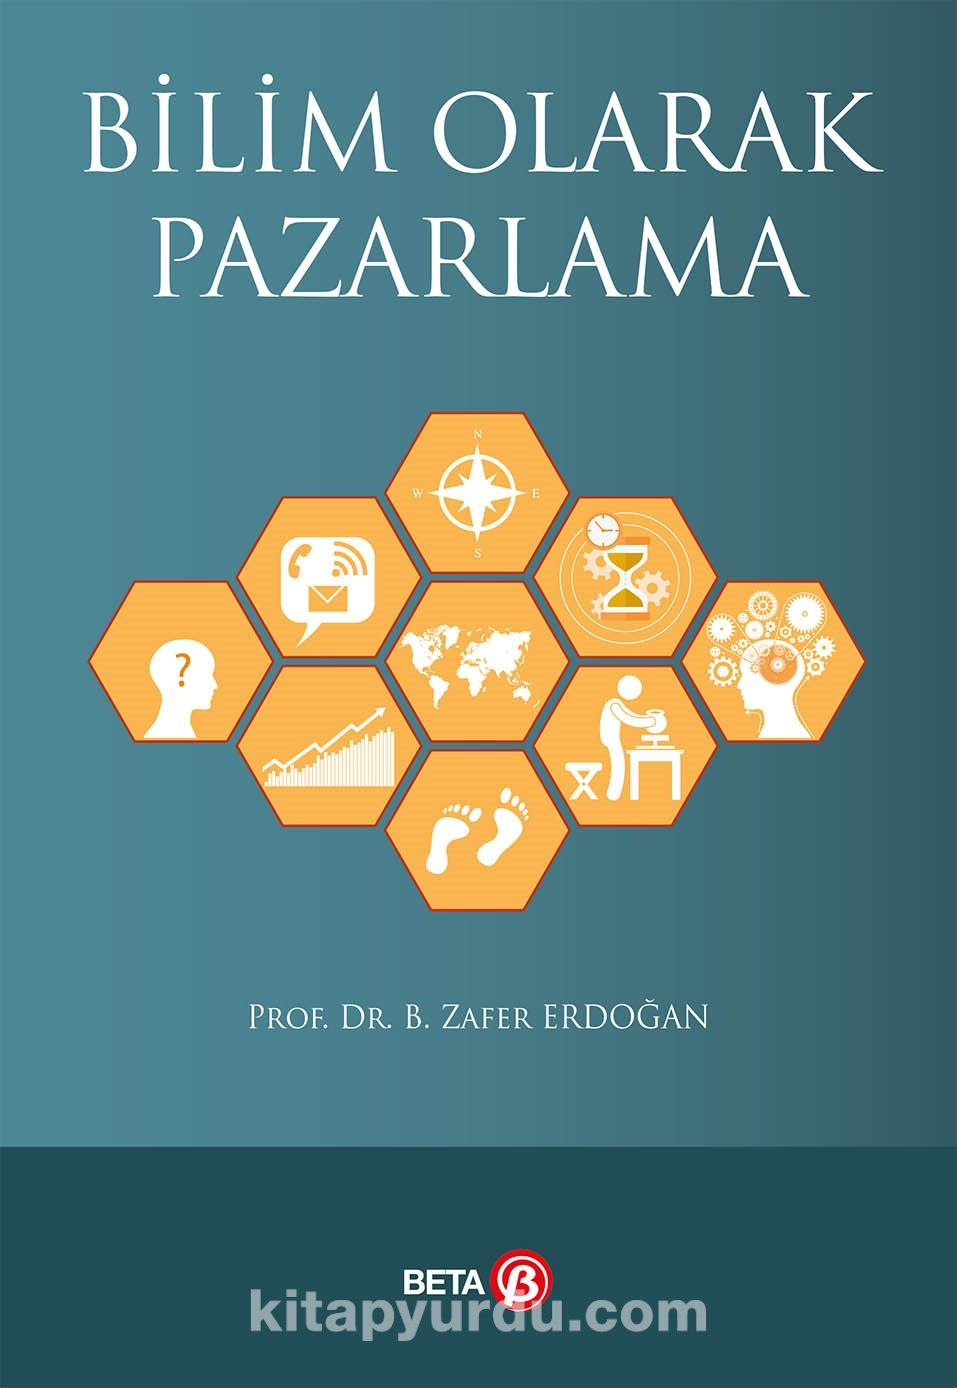 Bilim Olarak Pazarlama - Prof. Dr. B. Zafer Erdoğan pdf epub